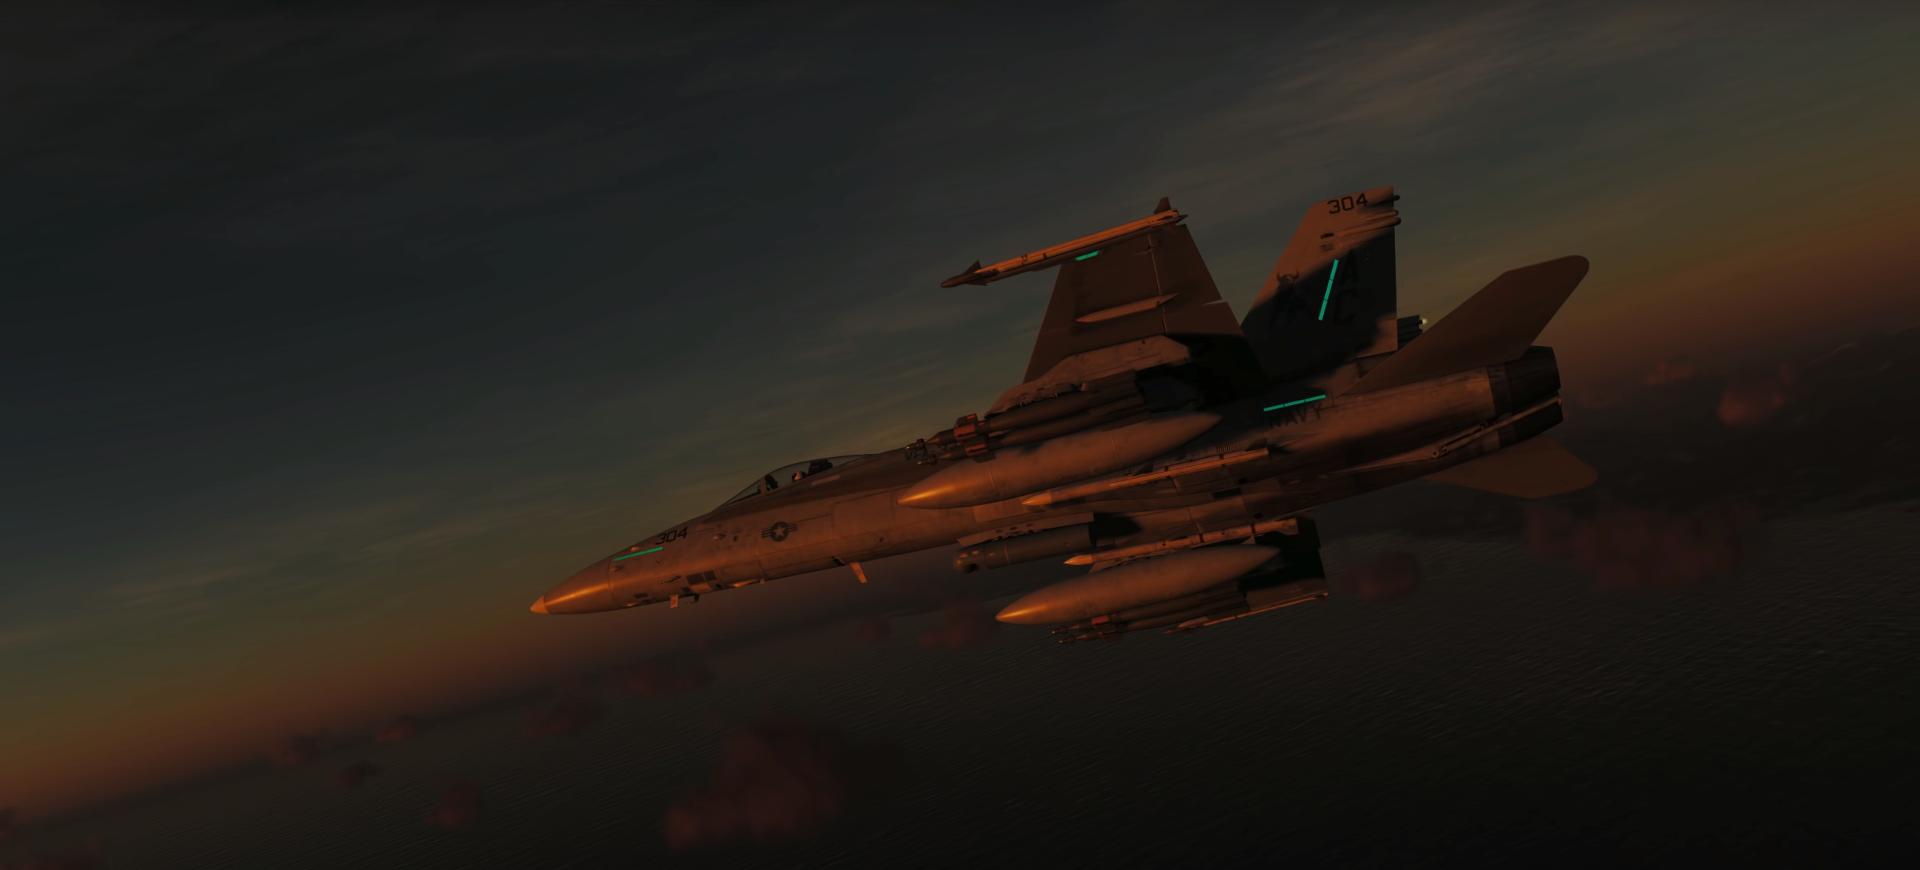 FA-18C Hornet ? Tgp